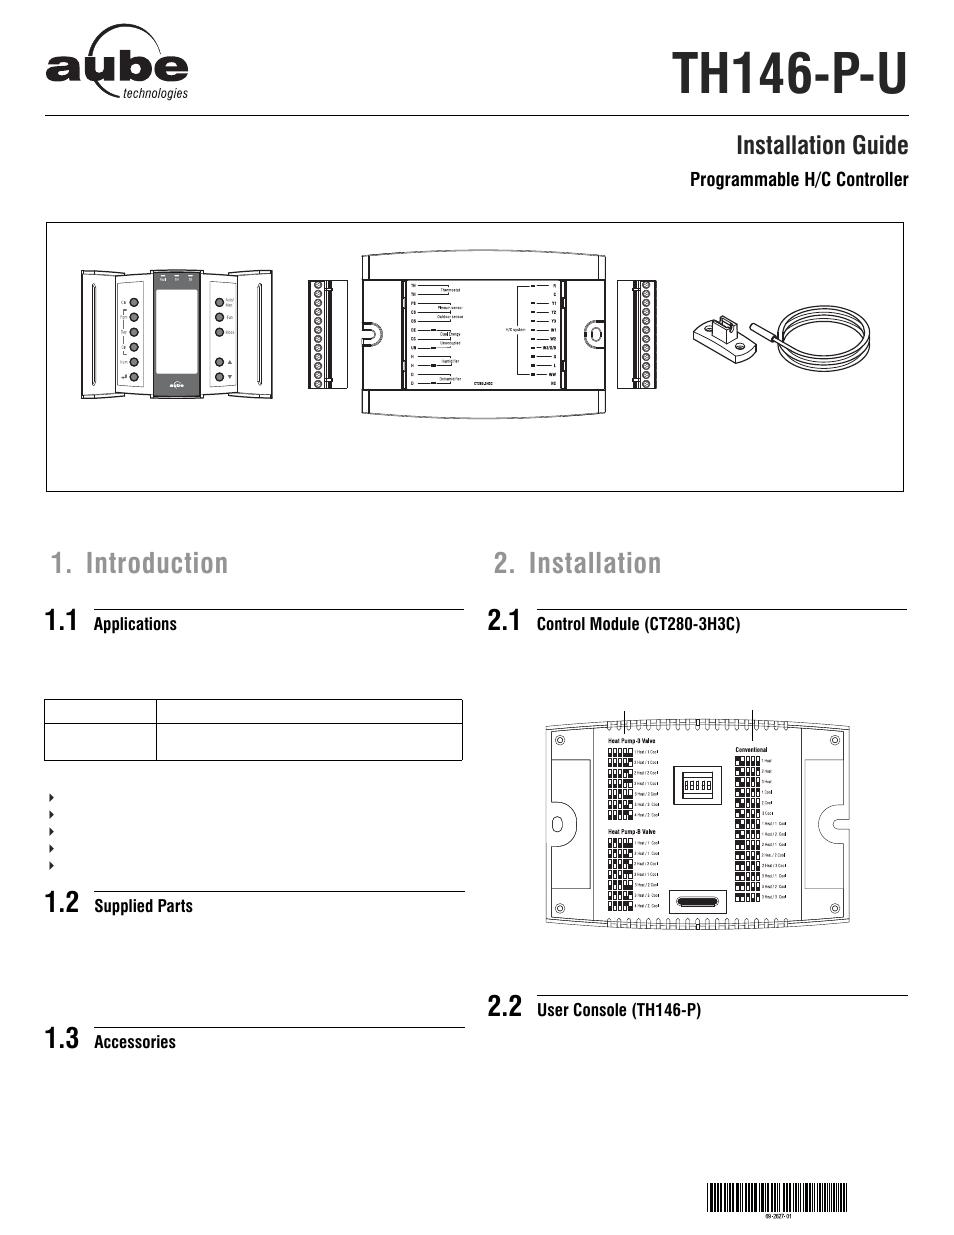 aube technologies programmable h c controller th146 p u user manual rh manualsdir com Aube Programmable Thermostat Aube Programmable Thermostat